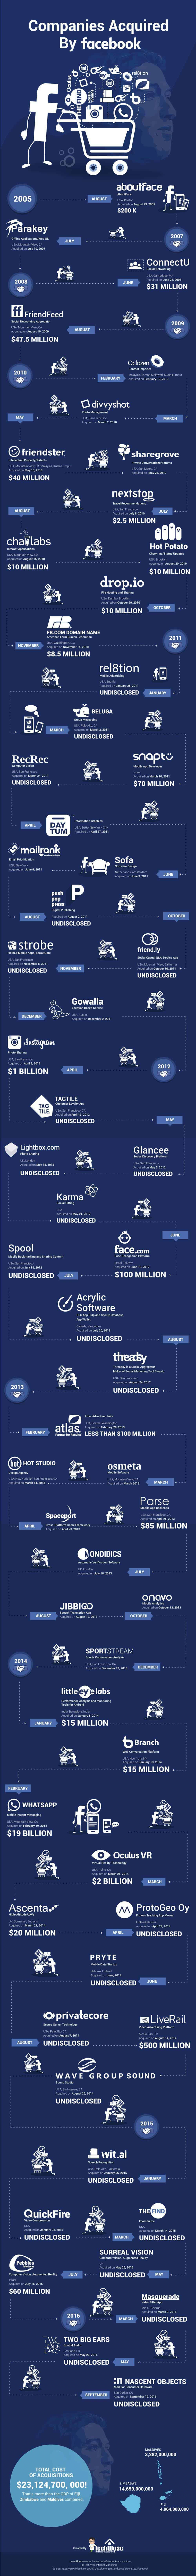 acquisitions facebook